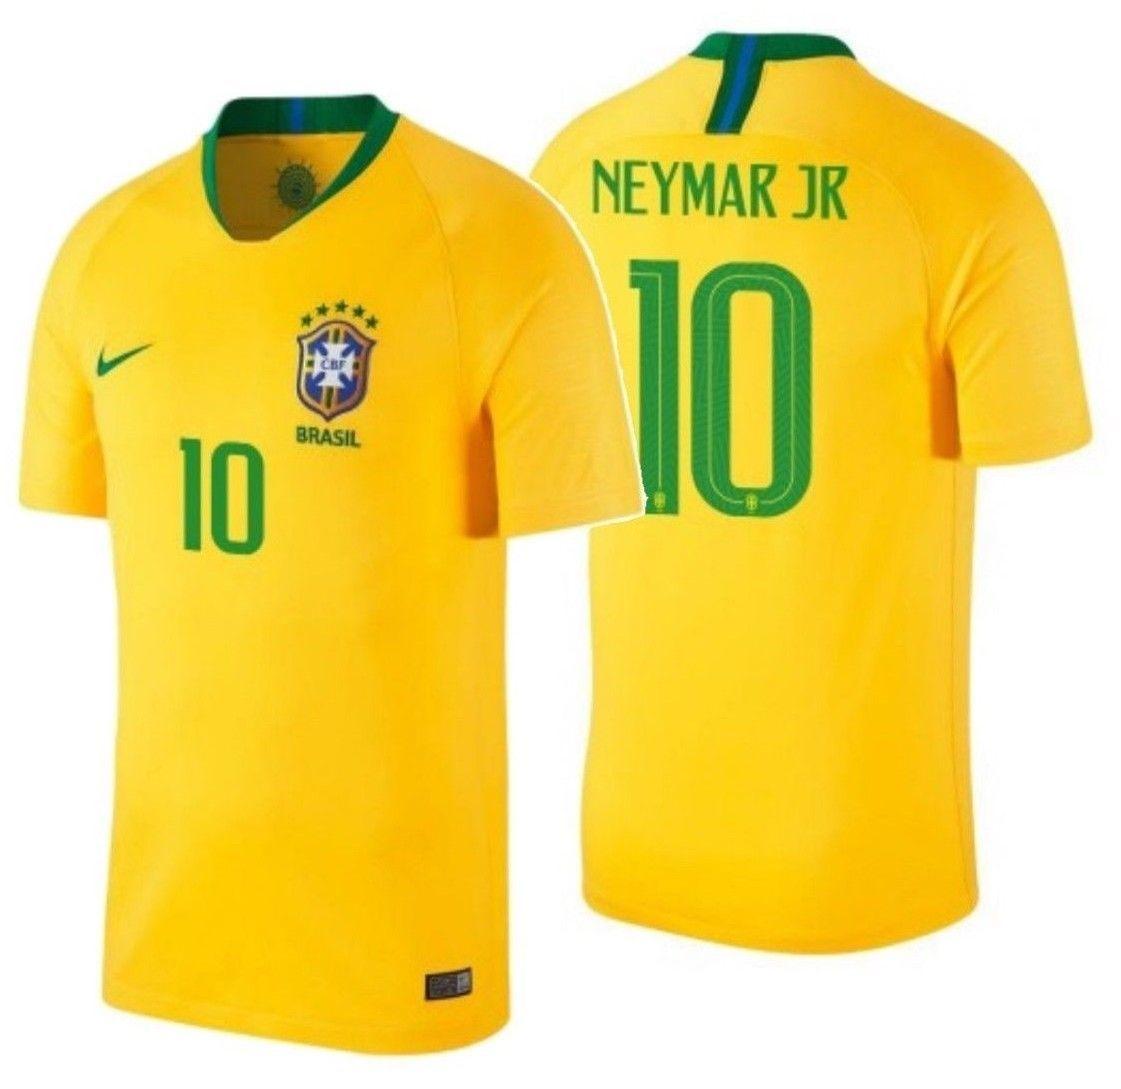 9f59e158b Nike Neymar Jr. Brazil Home Jersey Fifa and 50 similar items. S l1600